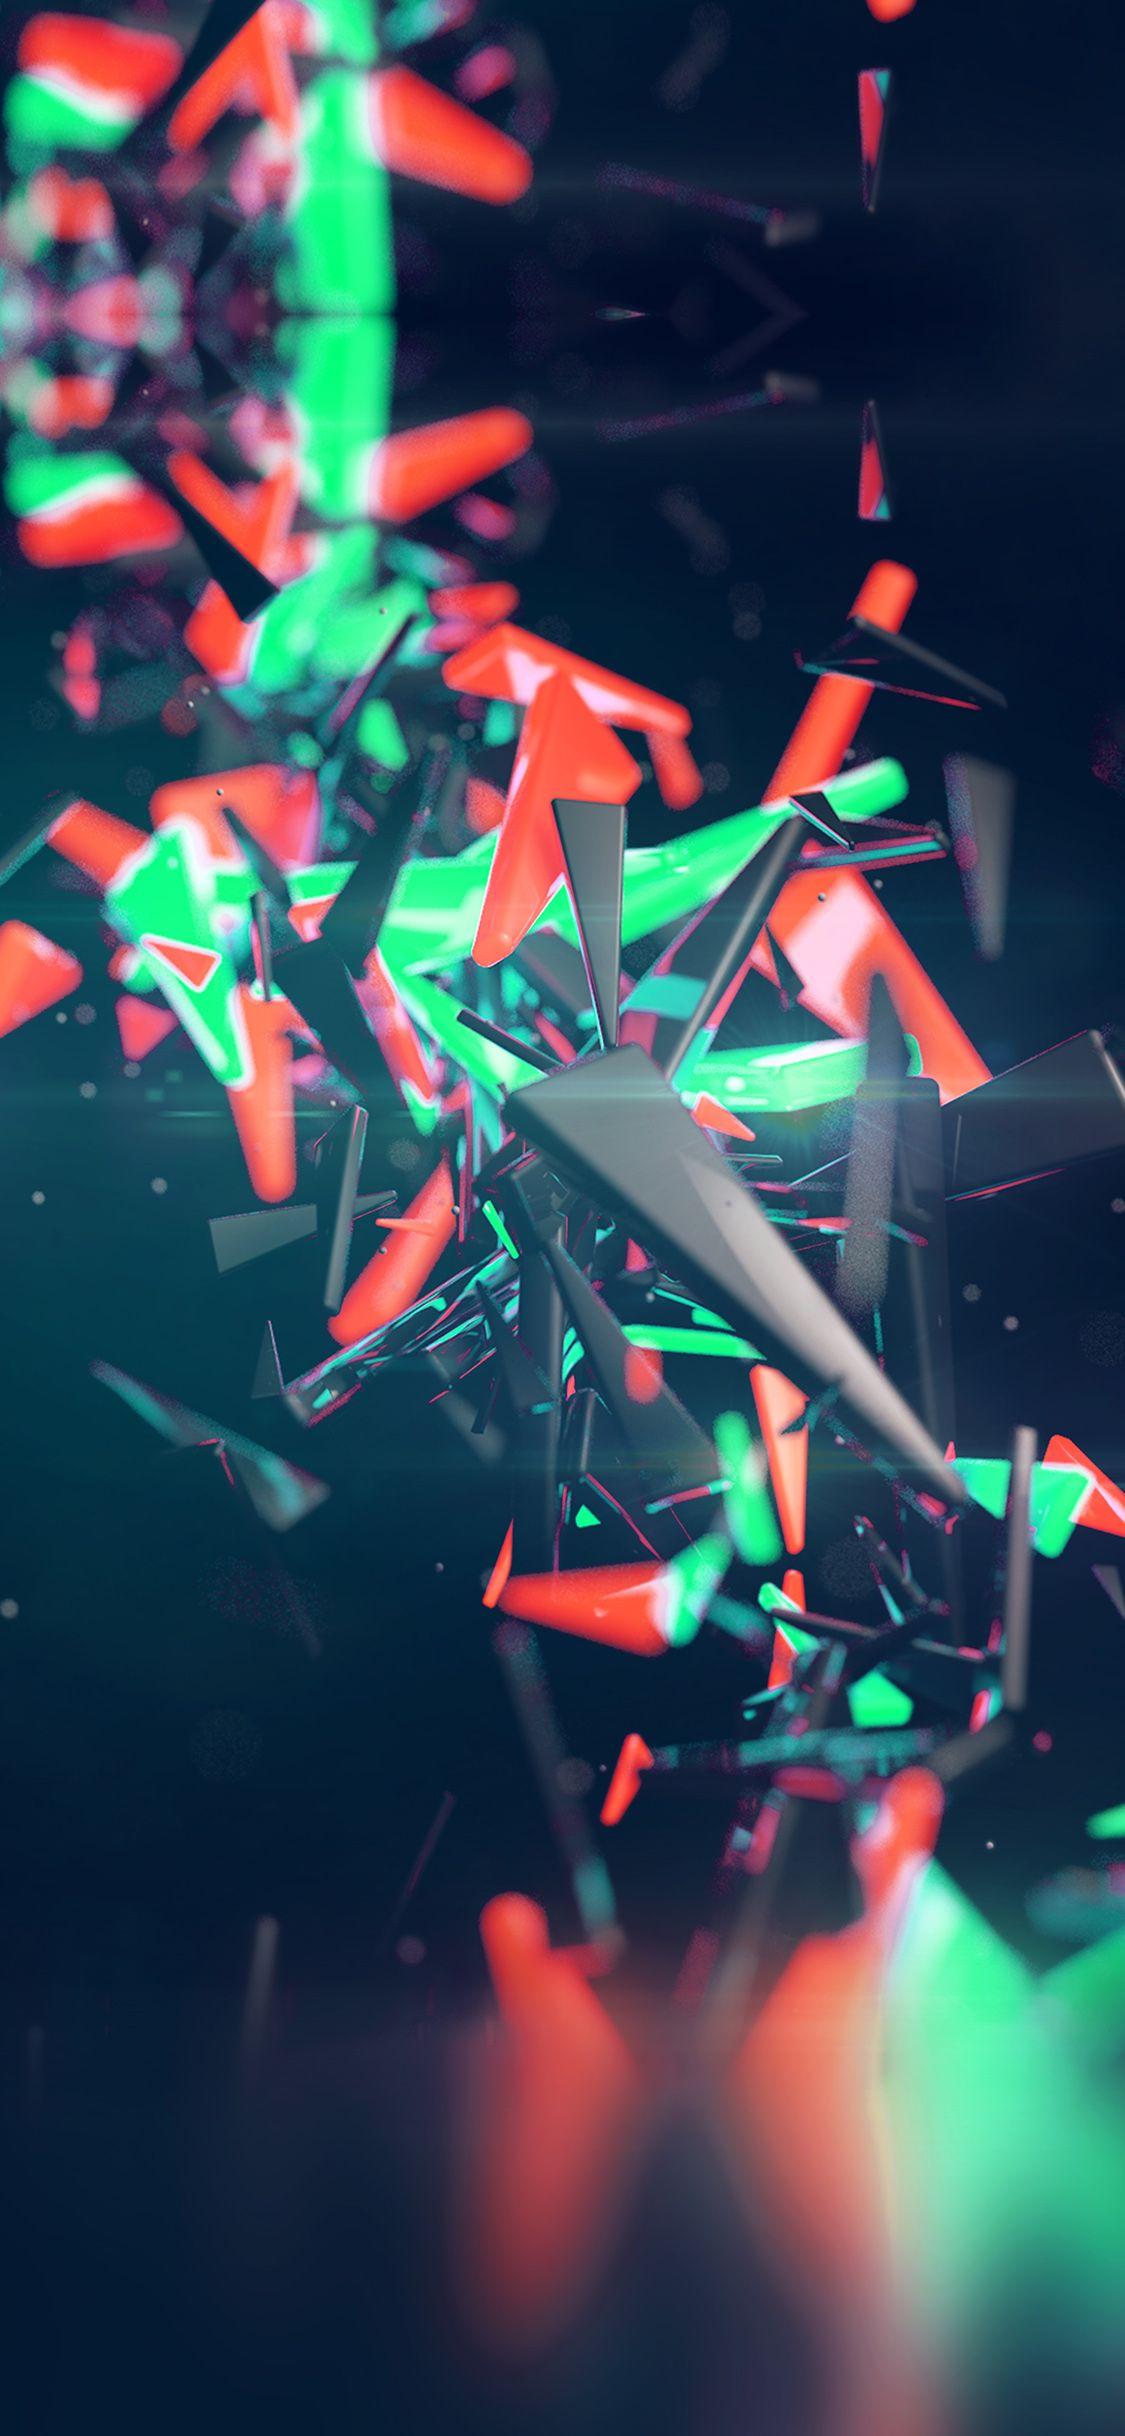 papers.covl32galaxynexus7abstractbluereddigital